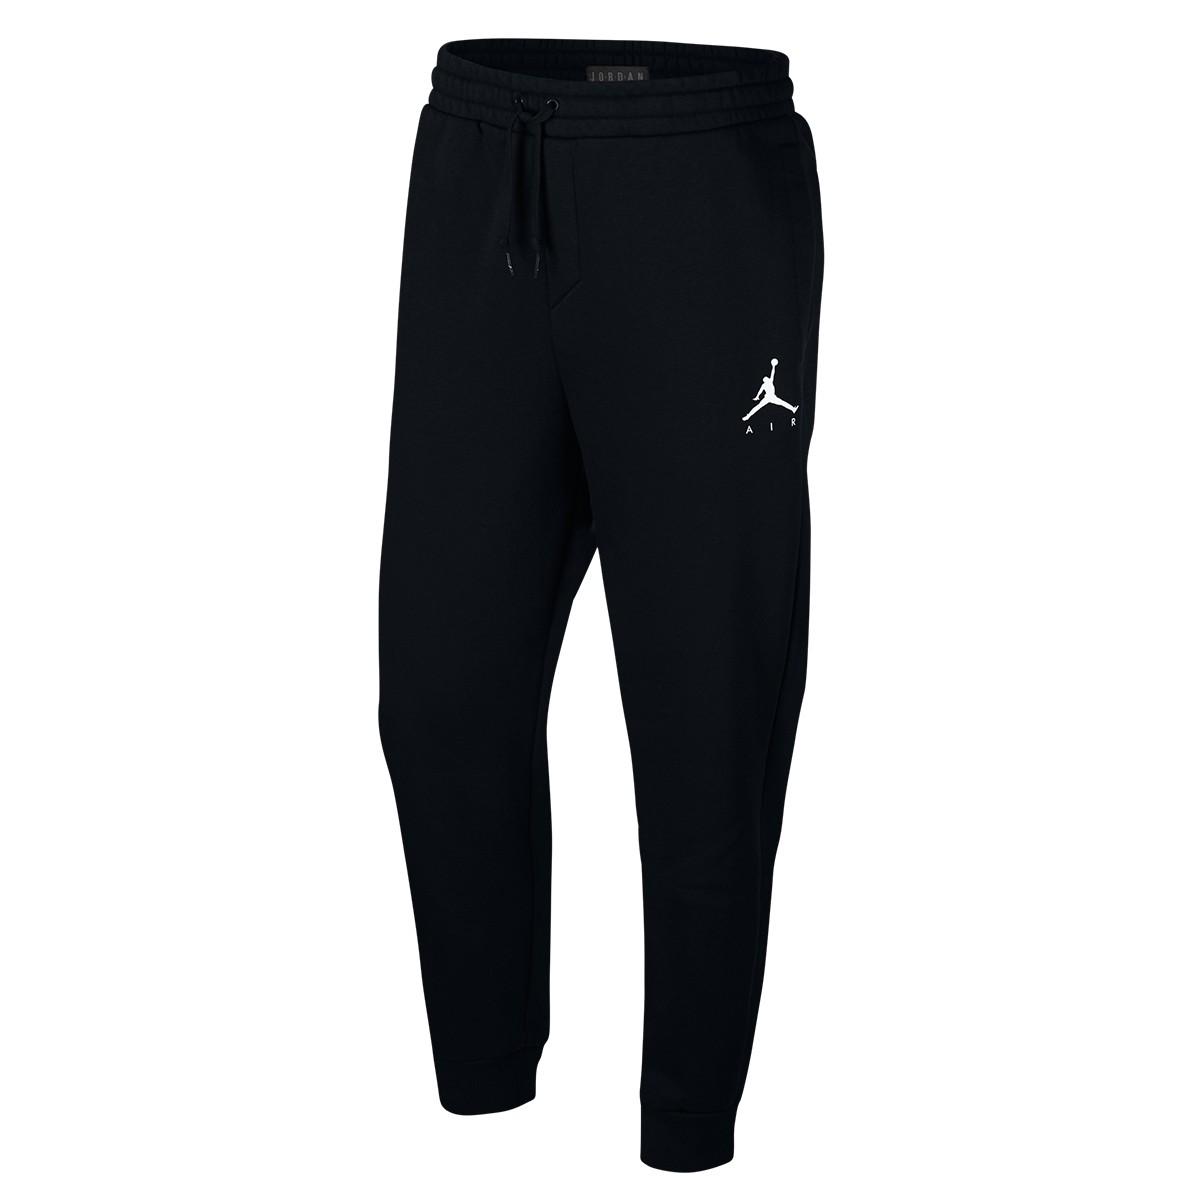 Jordan Jumpman Fleece Pants 'Black'